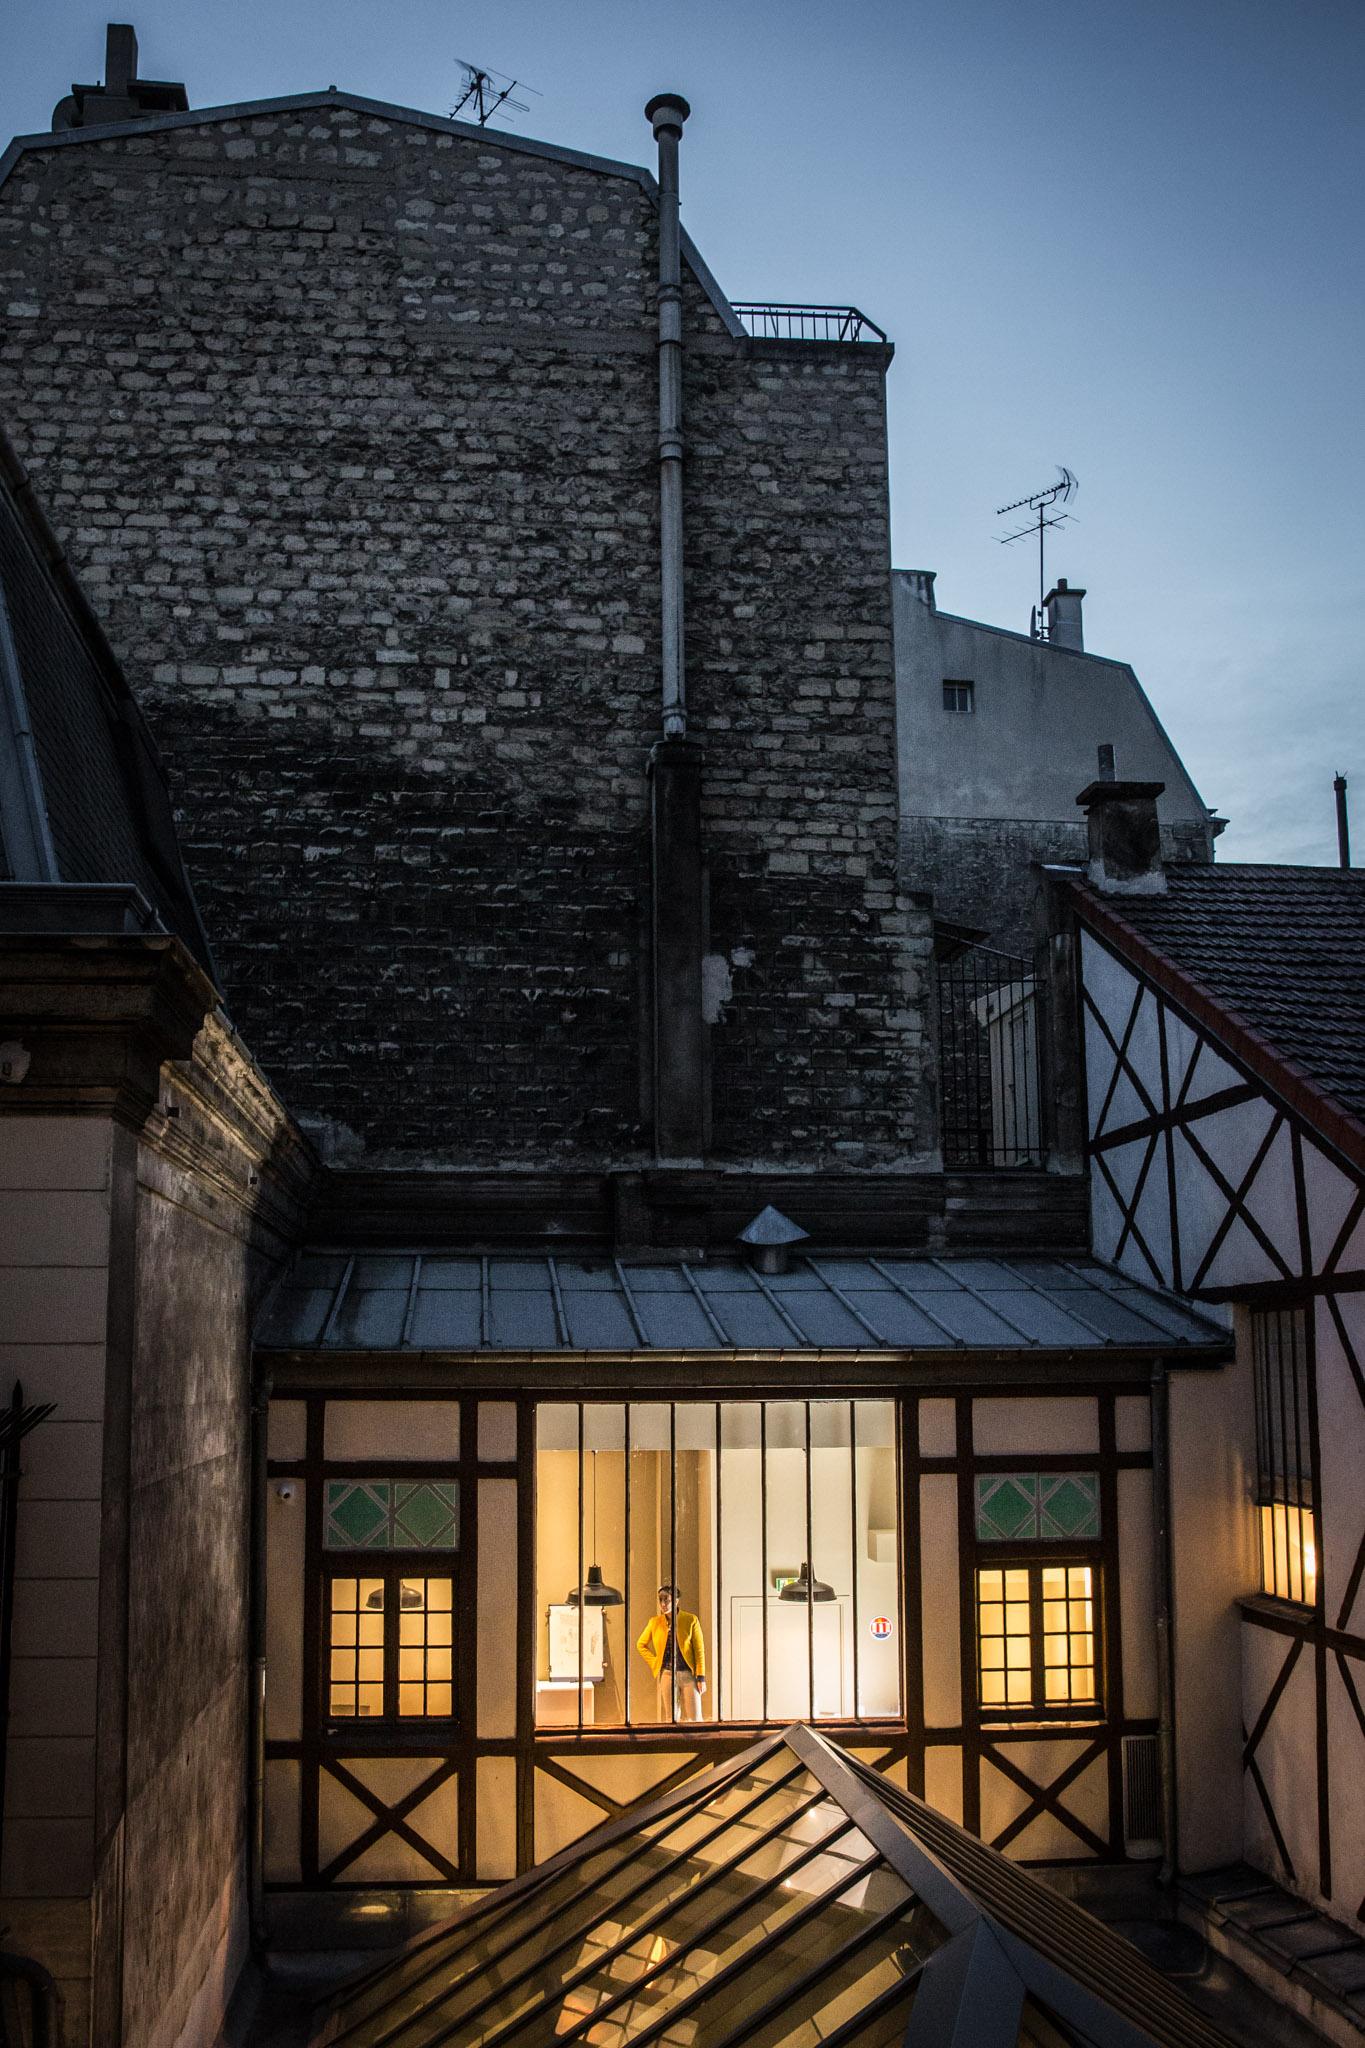 atelier_artiste_paris_art_nuit_architecture_manolo_mylonas